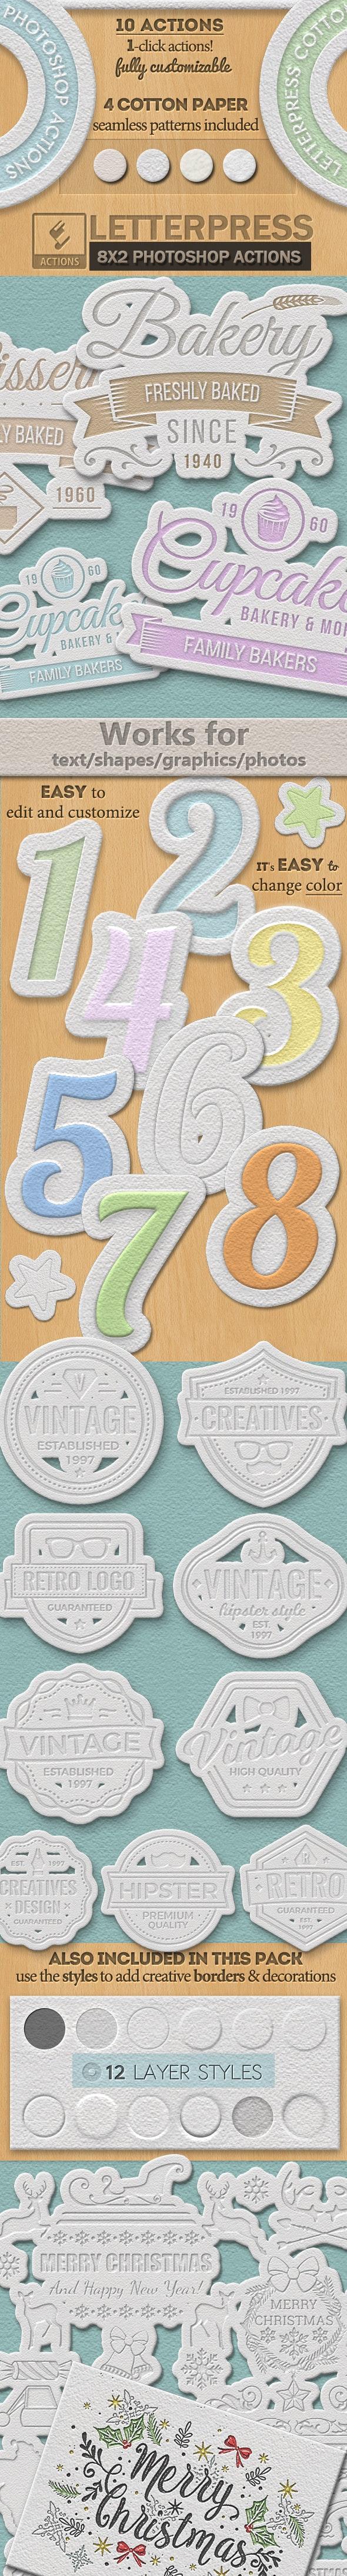 Cotton Letterpress Style Photoshop Creator - Utilities Actions